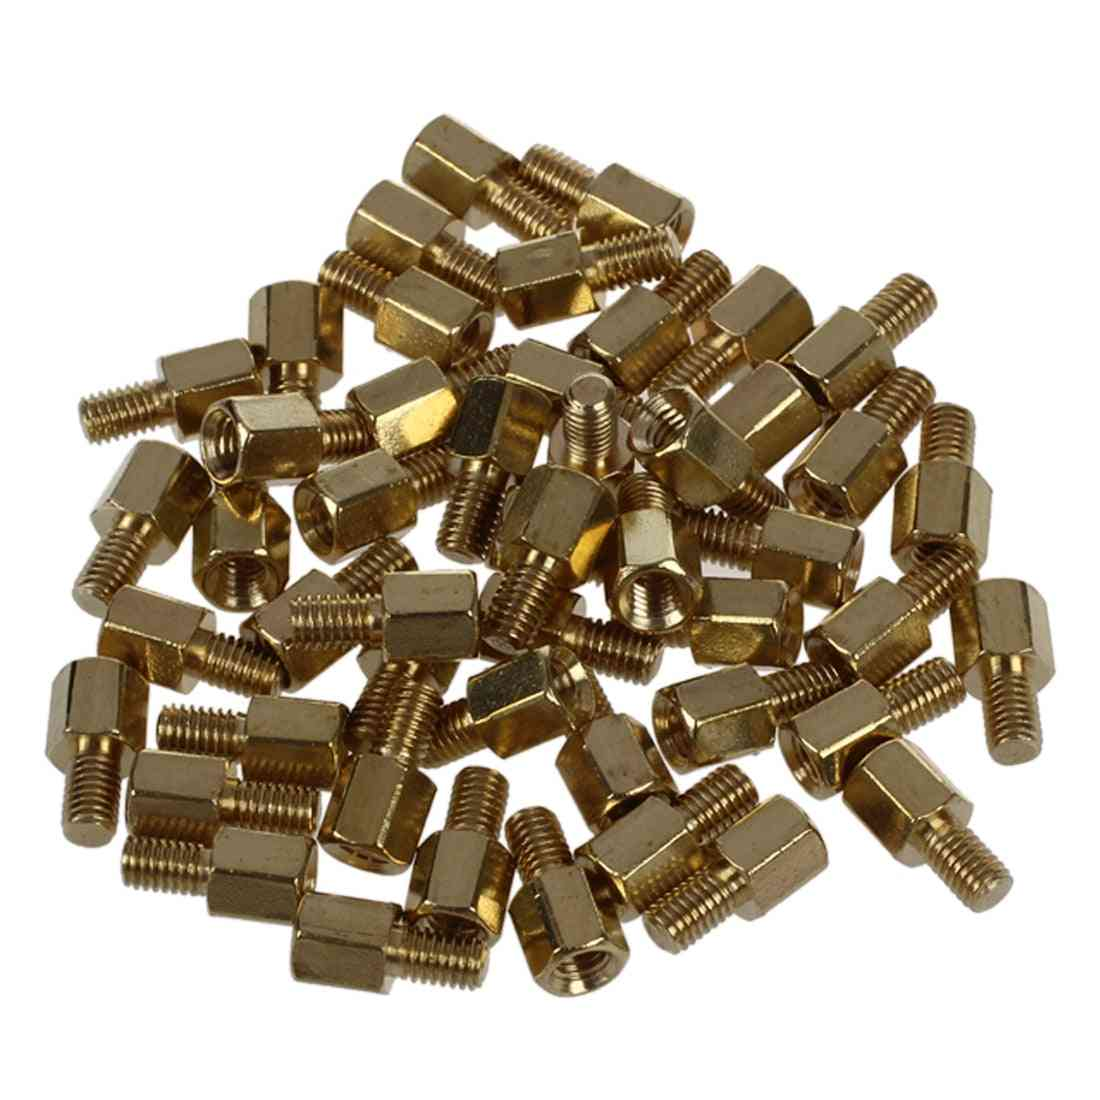 Brass Screw - Pcb Standoffs Hexagonal Spacers, M3 Male & Female